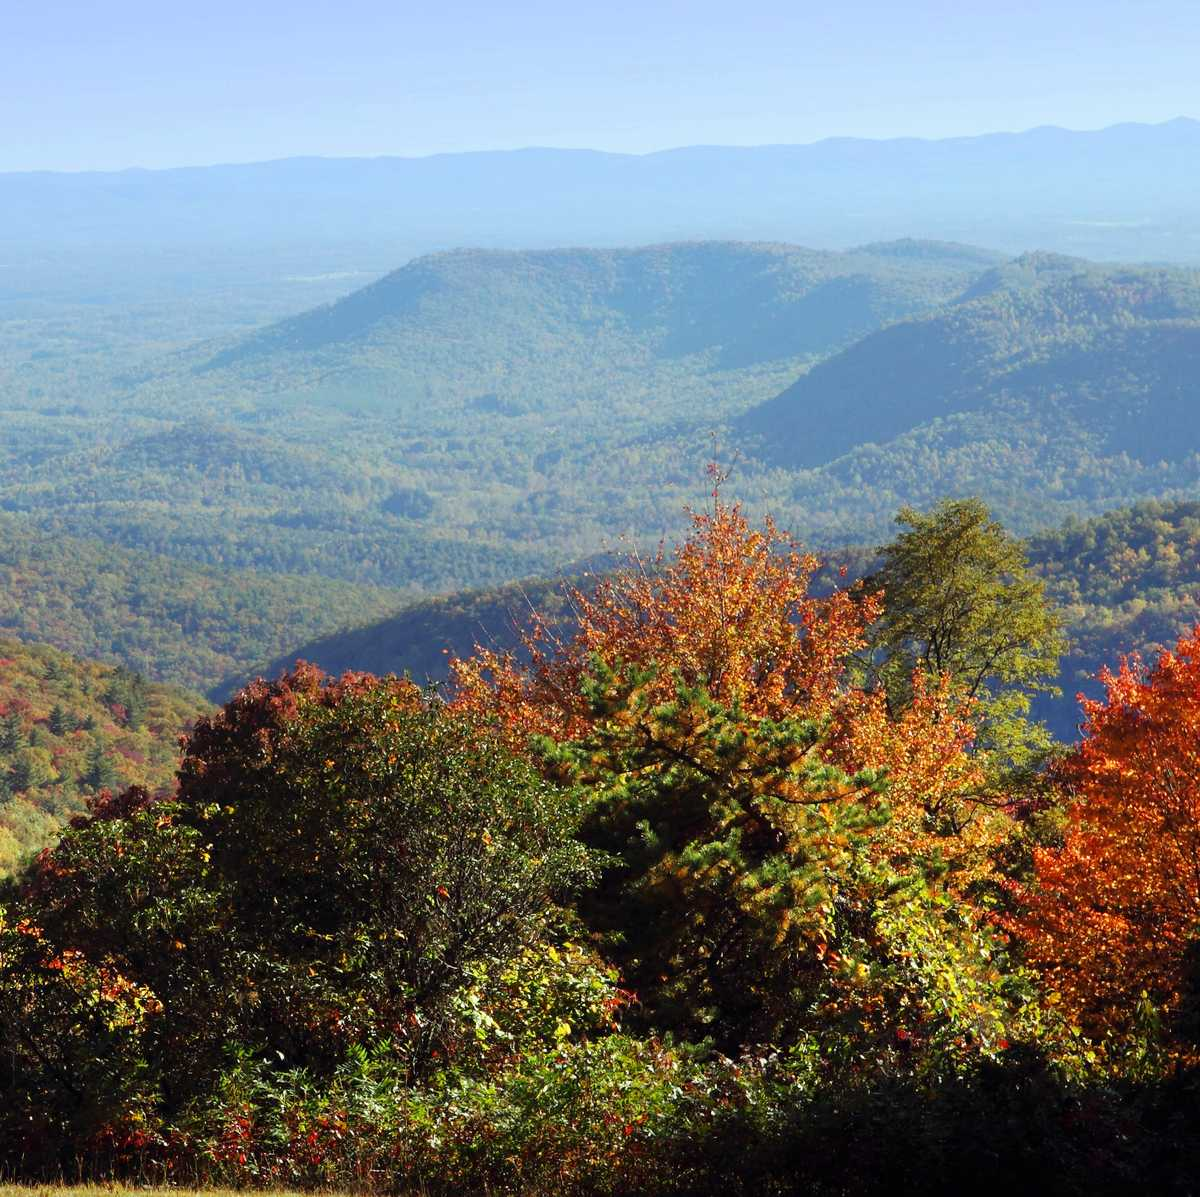 Blick ueber den Great Smoky Mountains National Park